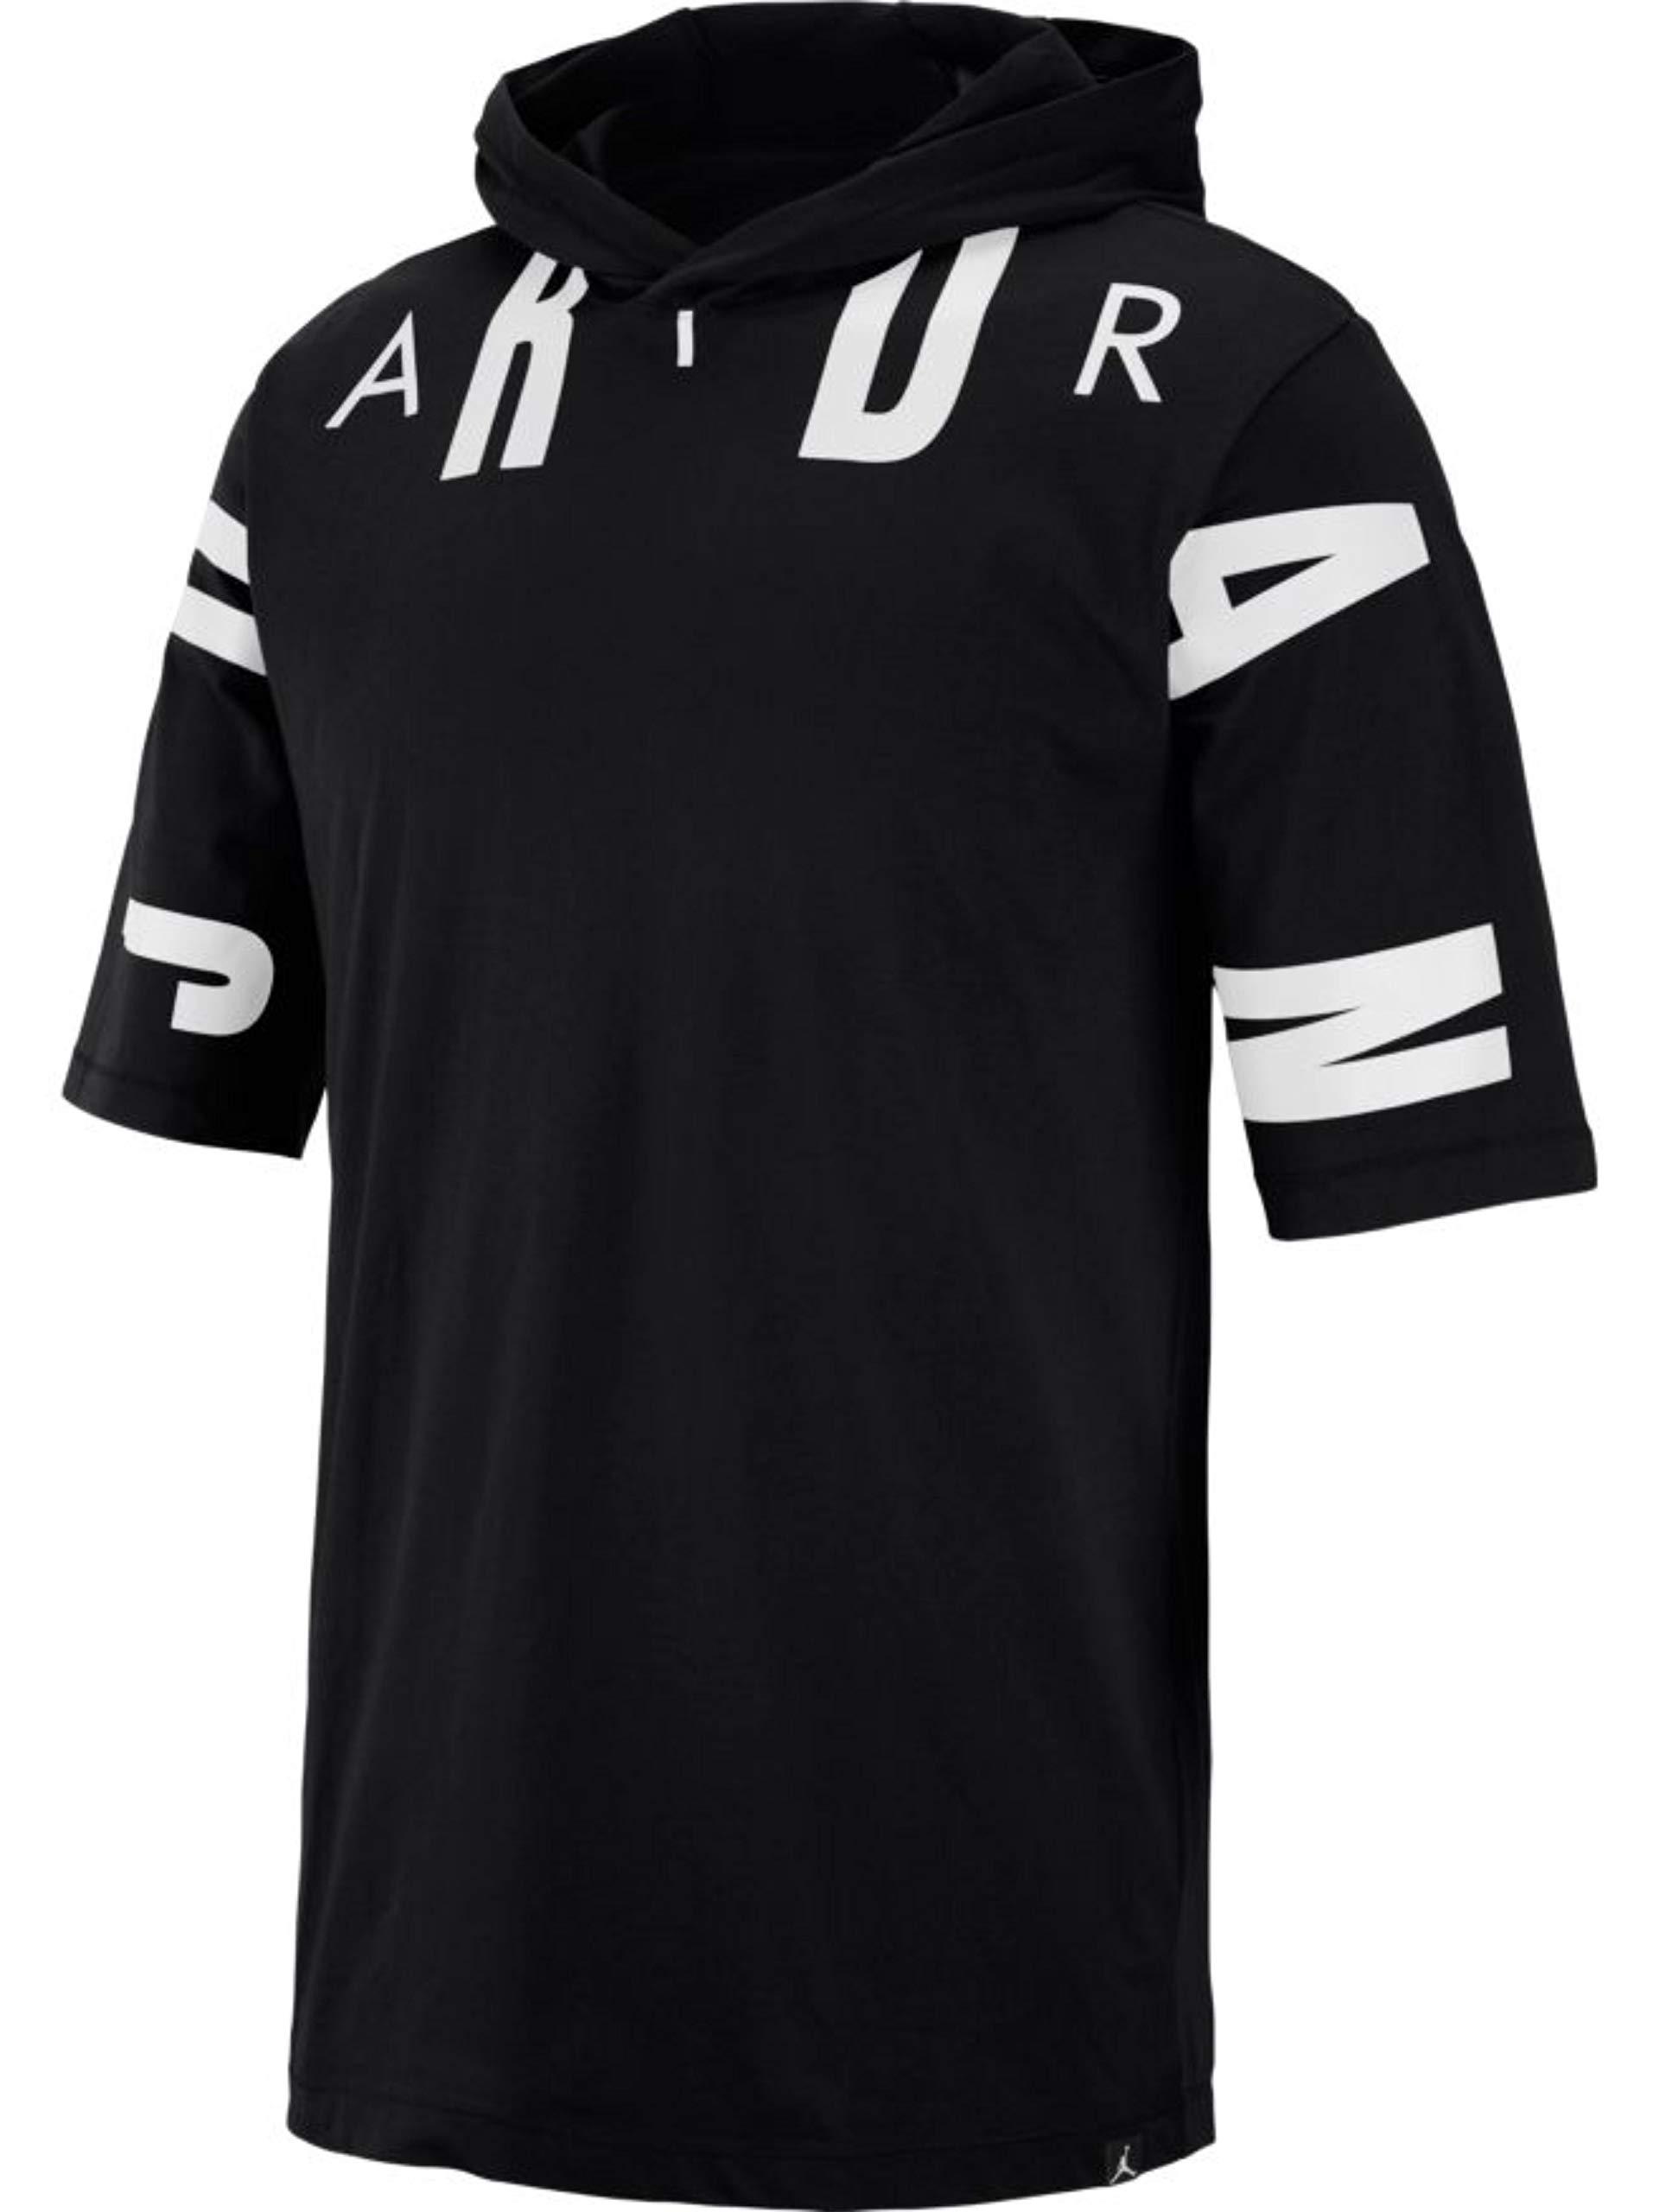 Jordan Sportswear 23 Men's Hooded T-Shirt - AA1915-010 Black/White (Medium)